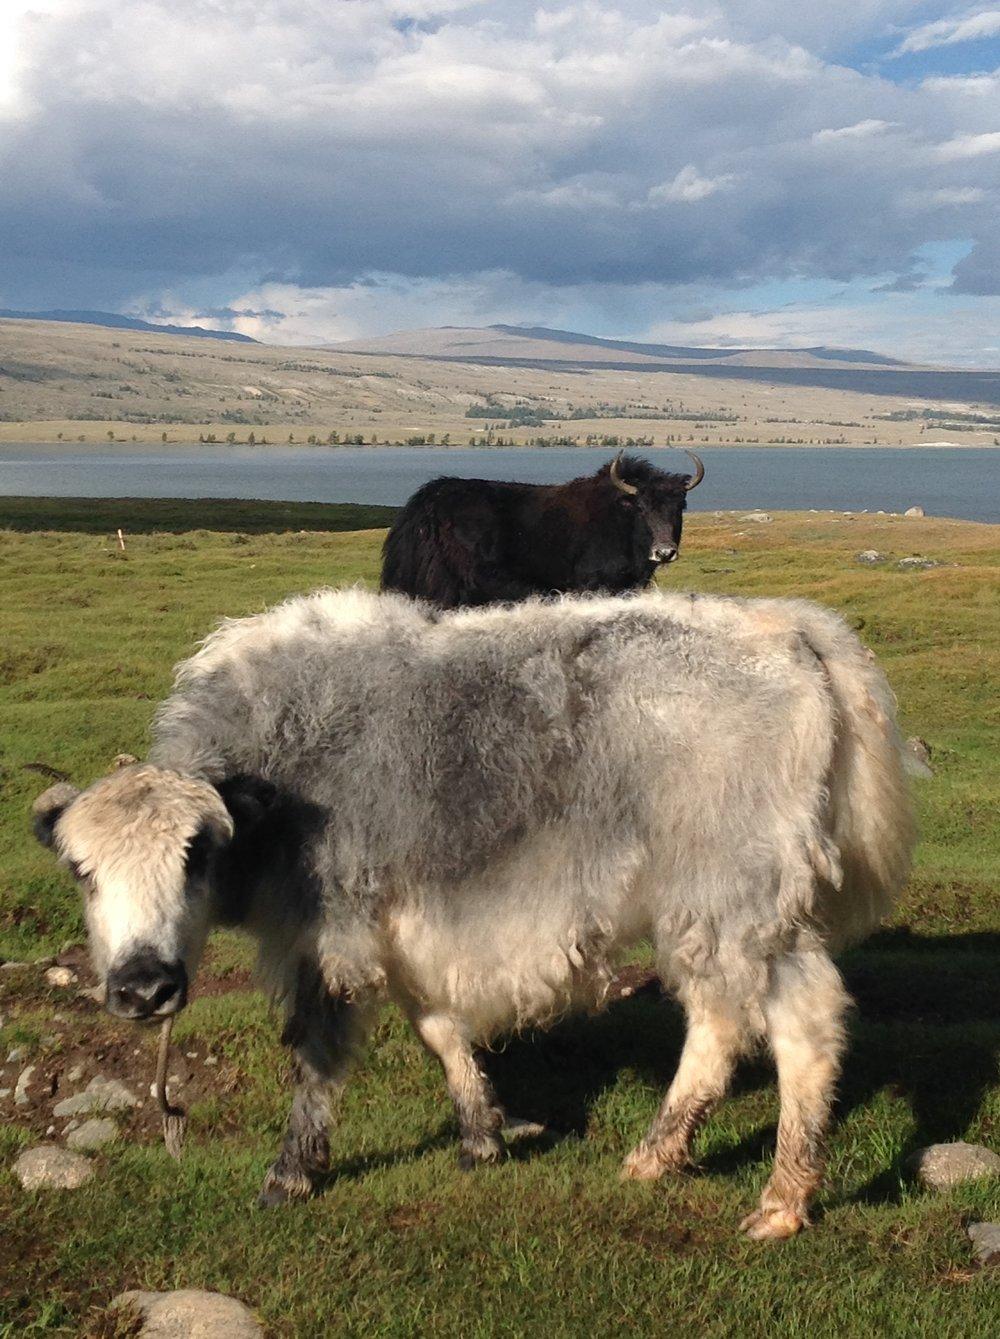 Yaks - Tavan Bogd National Park - Mongolia